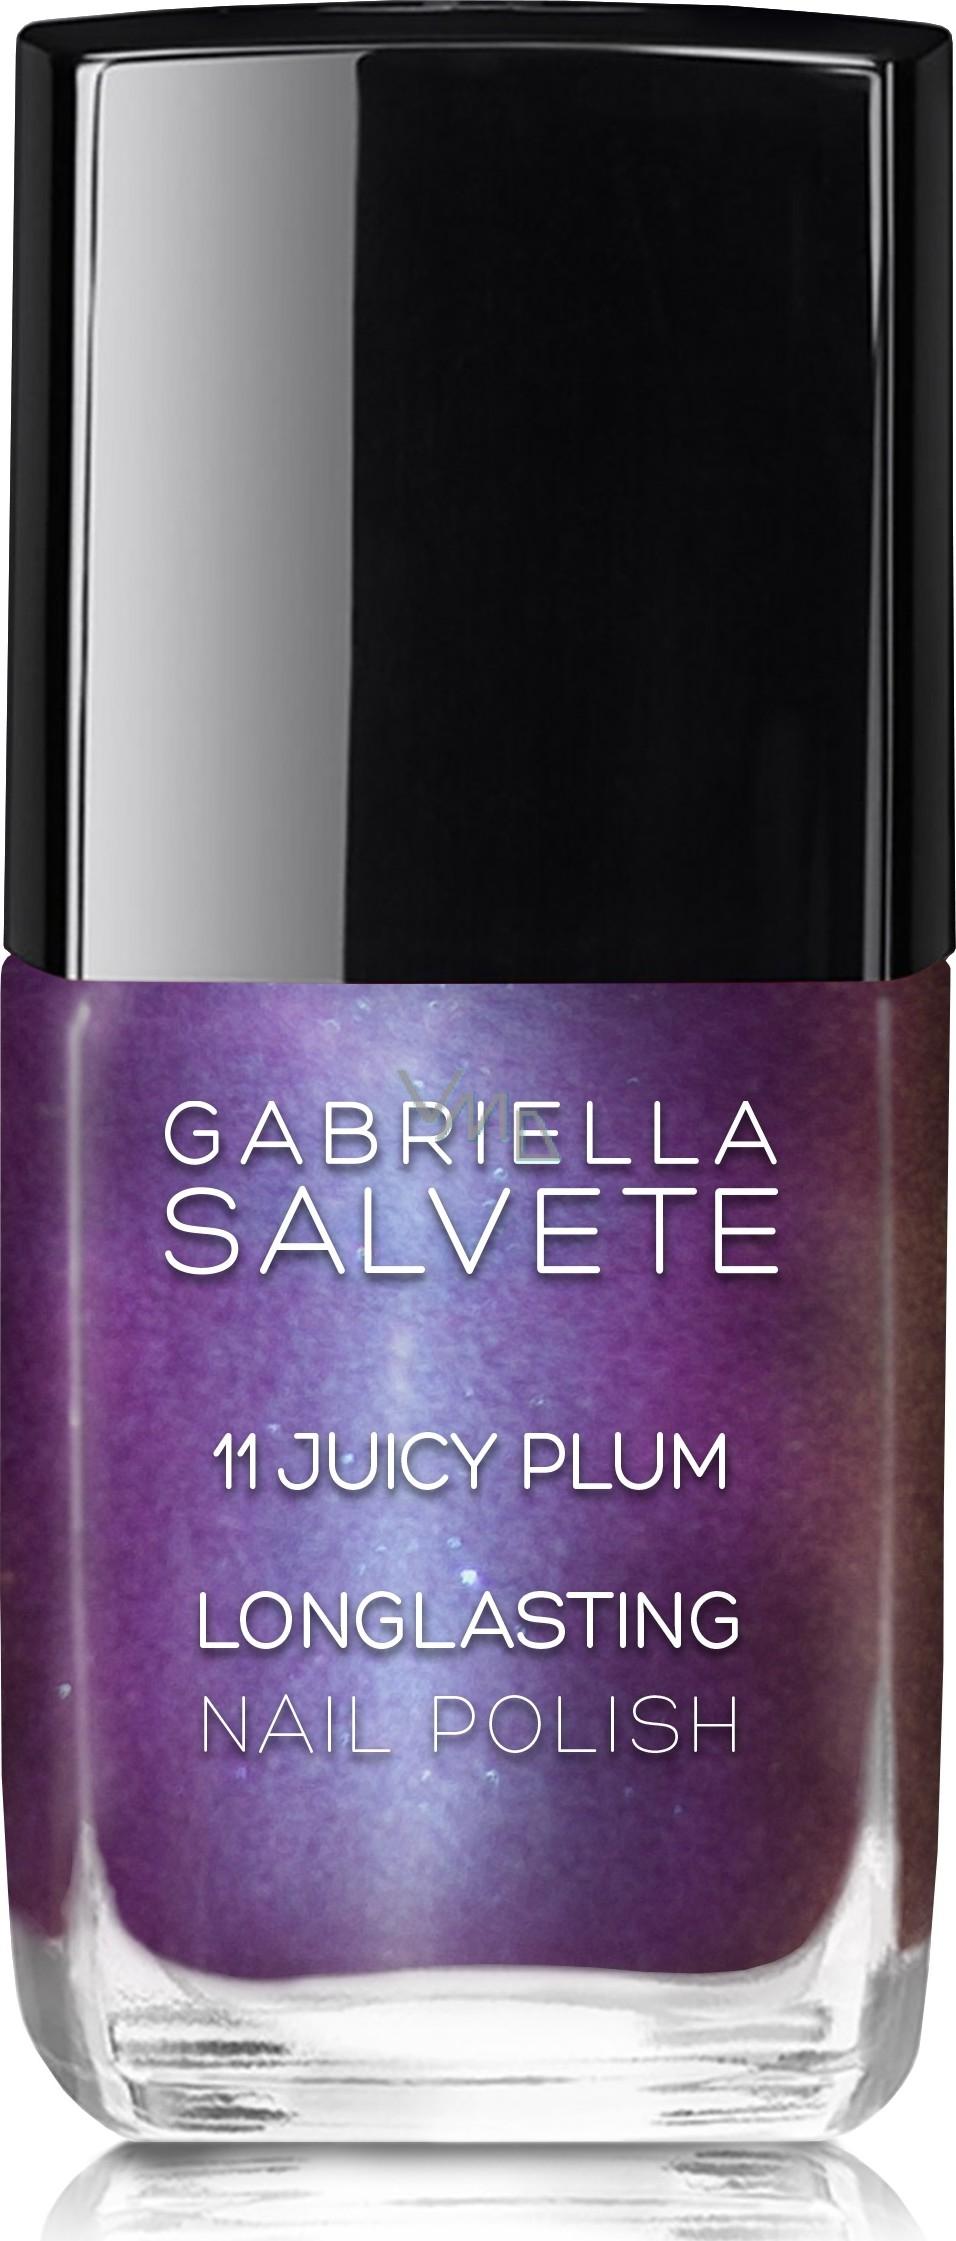 Gabriella Salvete Longlasting Enamel Lak Na Nehty 11 Juicy Plum 11 Ml Vmd Drogerie A Parfumerie